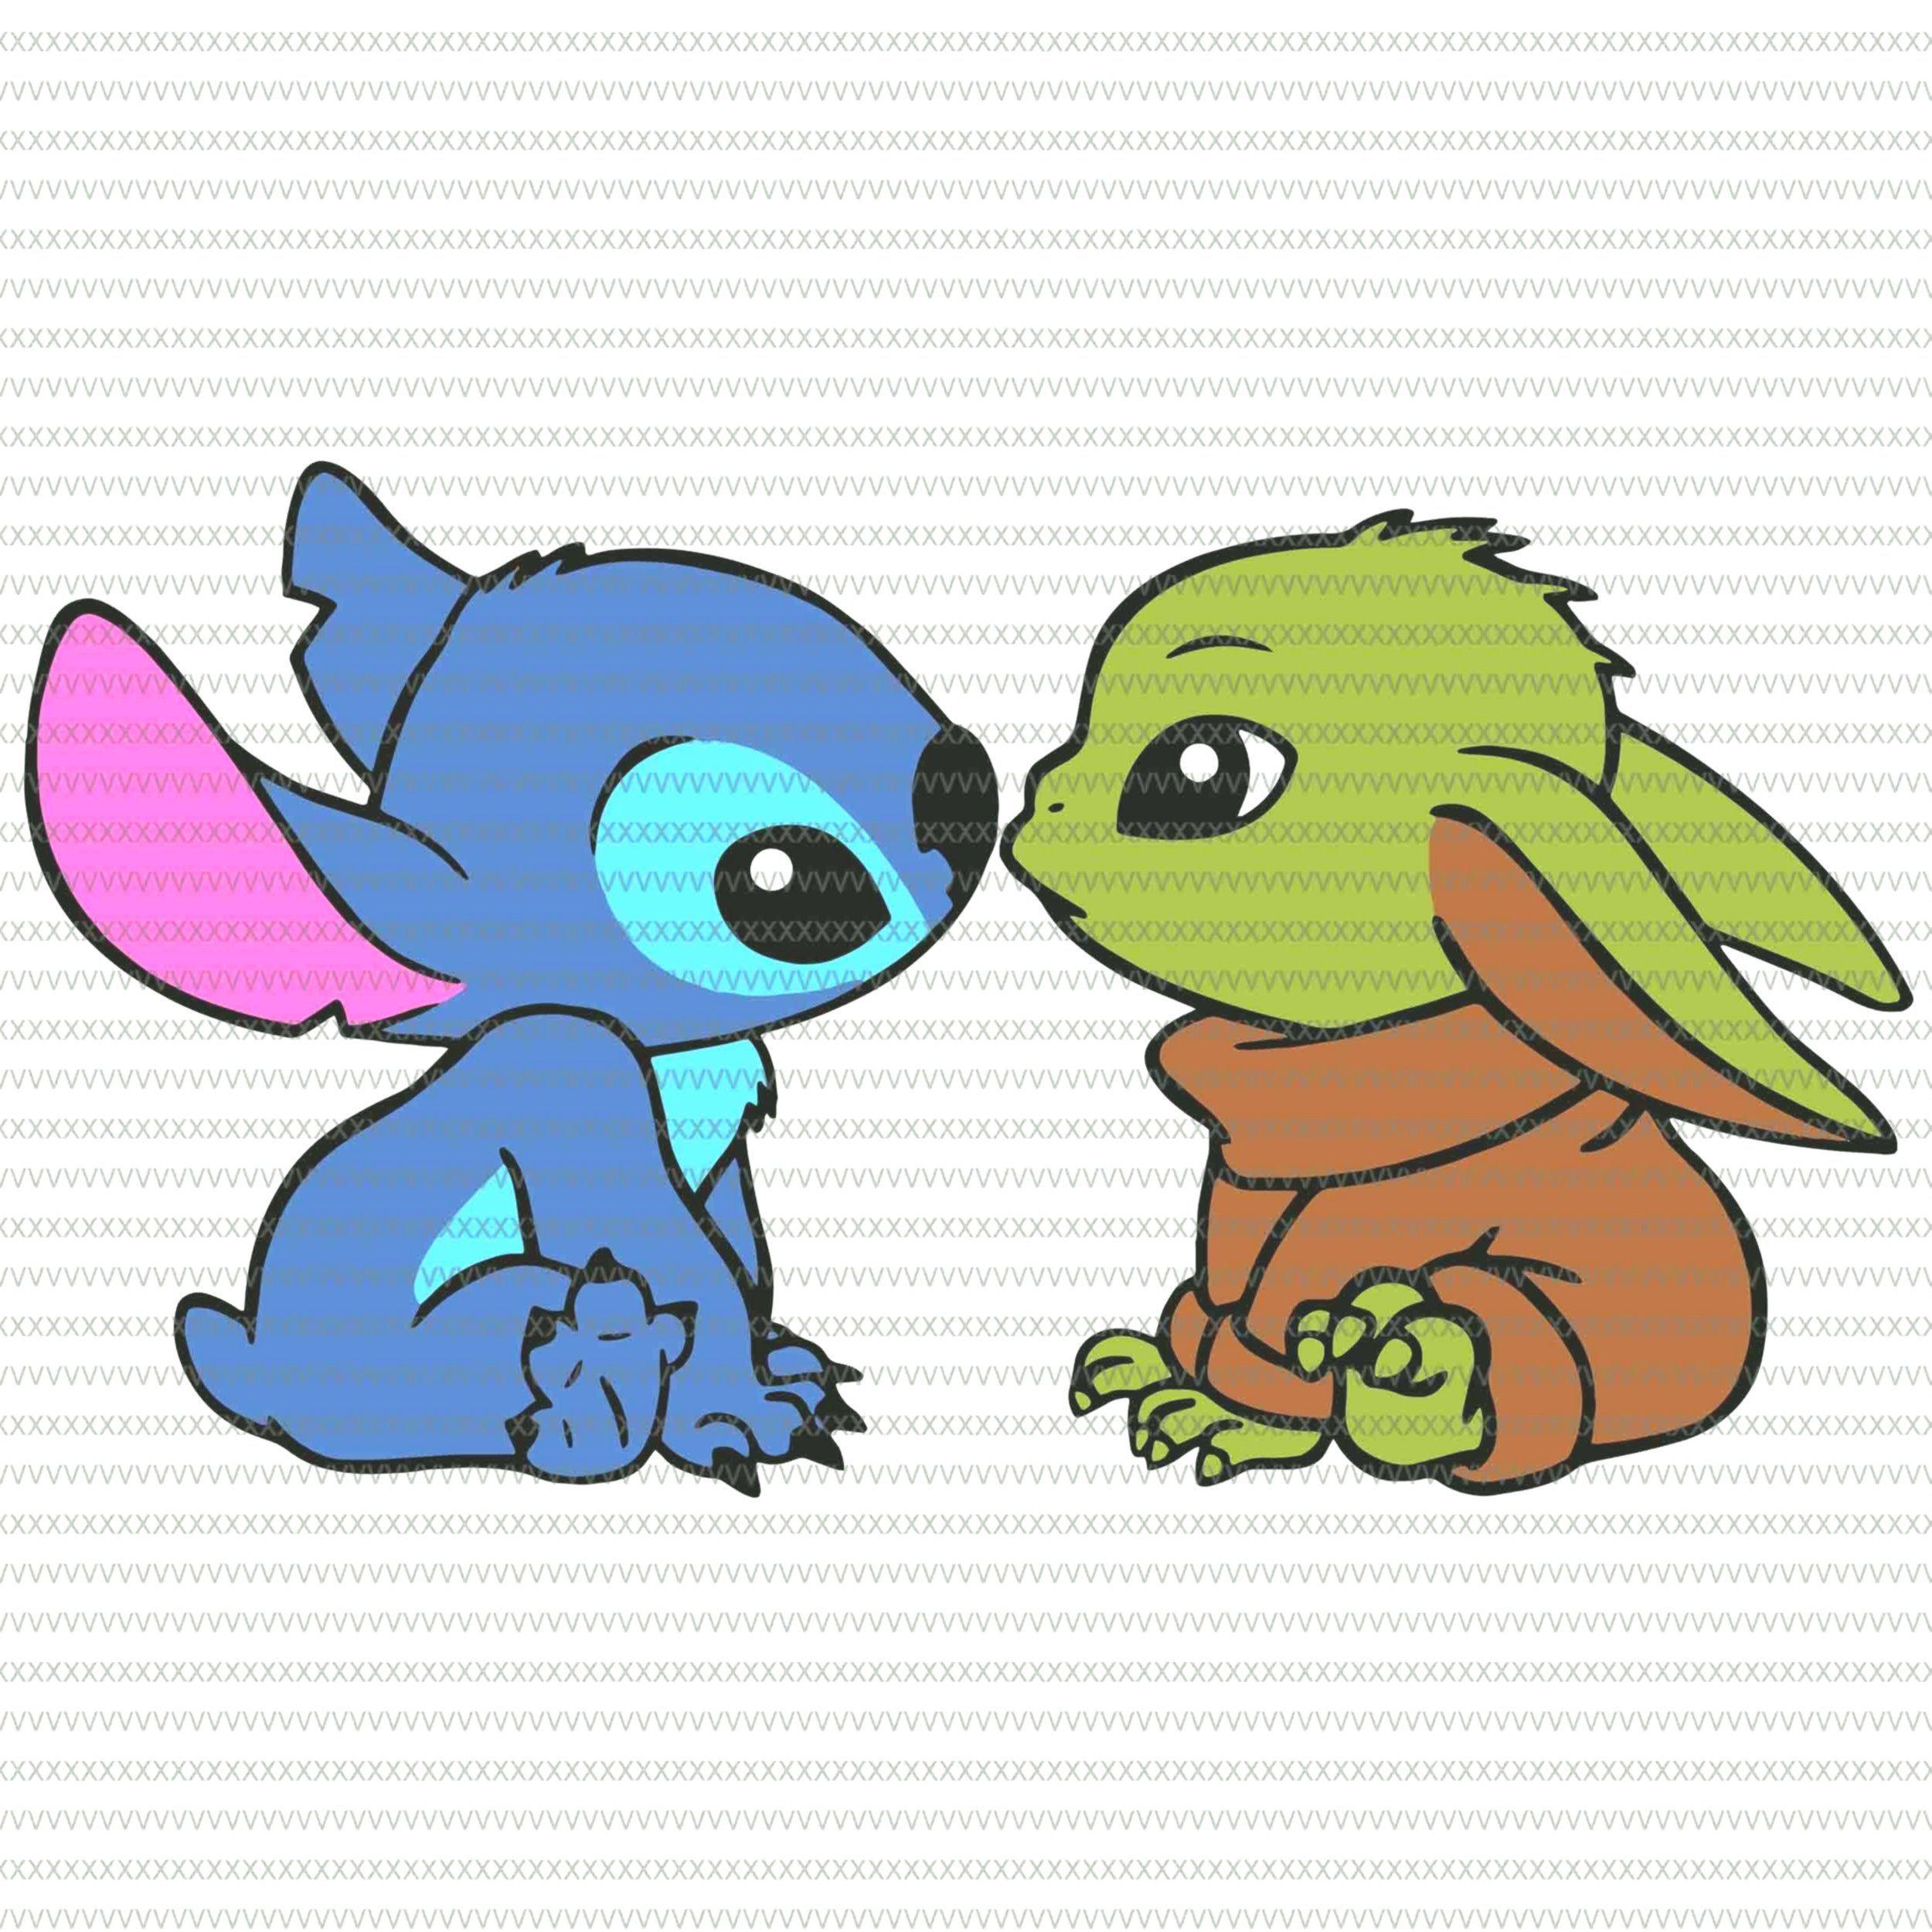 Baby Yoda And Stitch Pngbaby Yoda Pngbaby Yoda The Mandalorian Star Warsbaby Yoda The Mand Cute Cartoon Drawings Cute Cartoon Wallpapers Baby Disney Characters